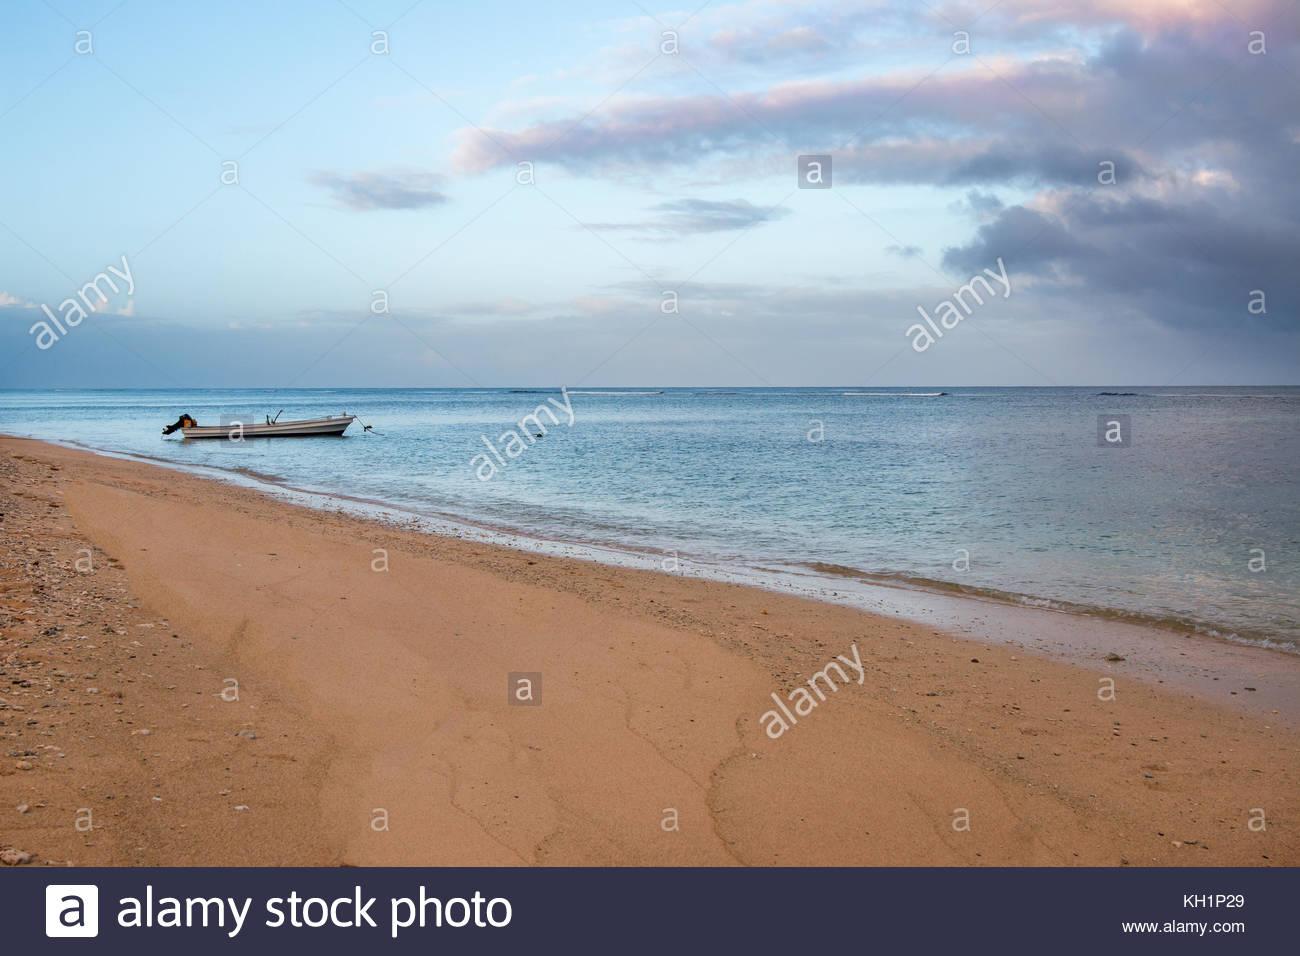 Boat anchored on a beach, Tonga - Stock Image